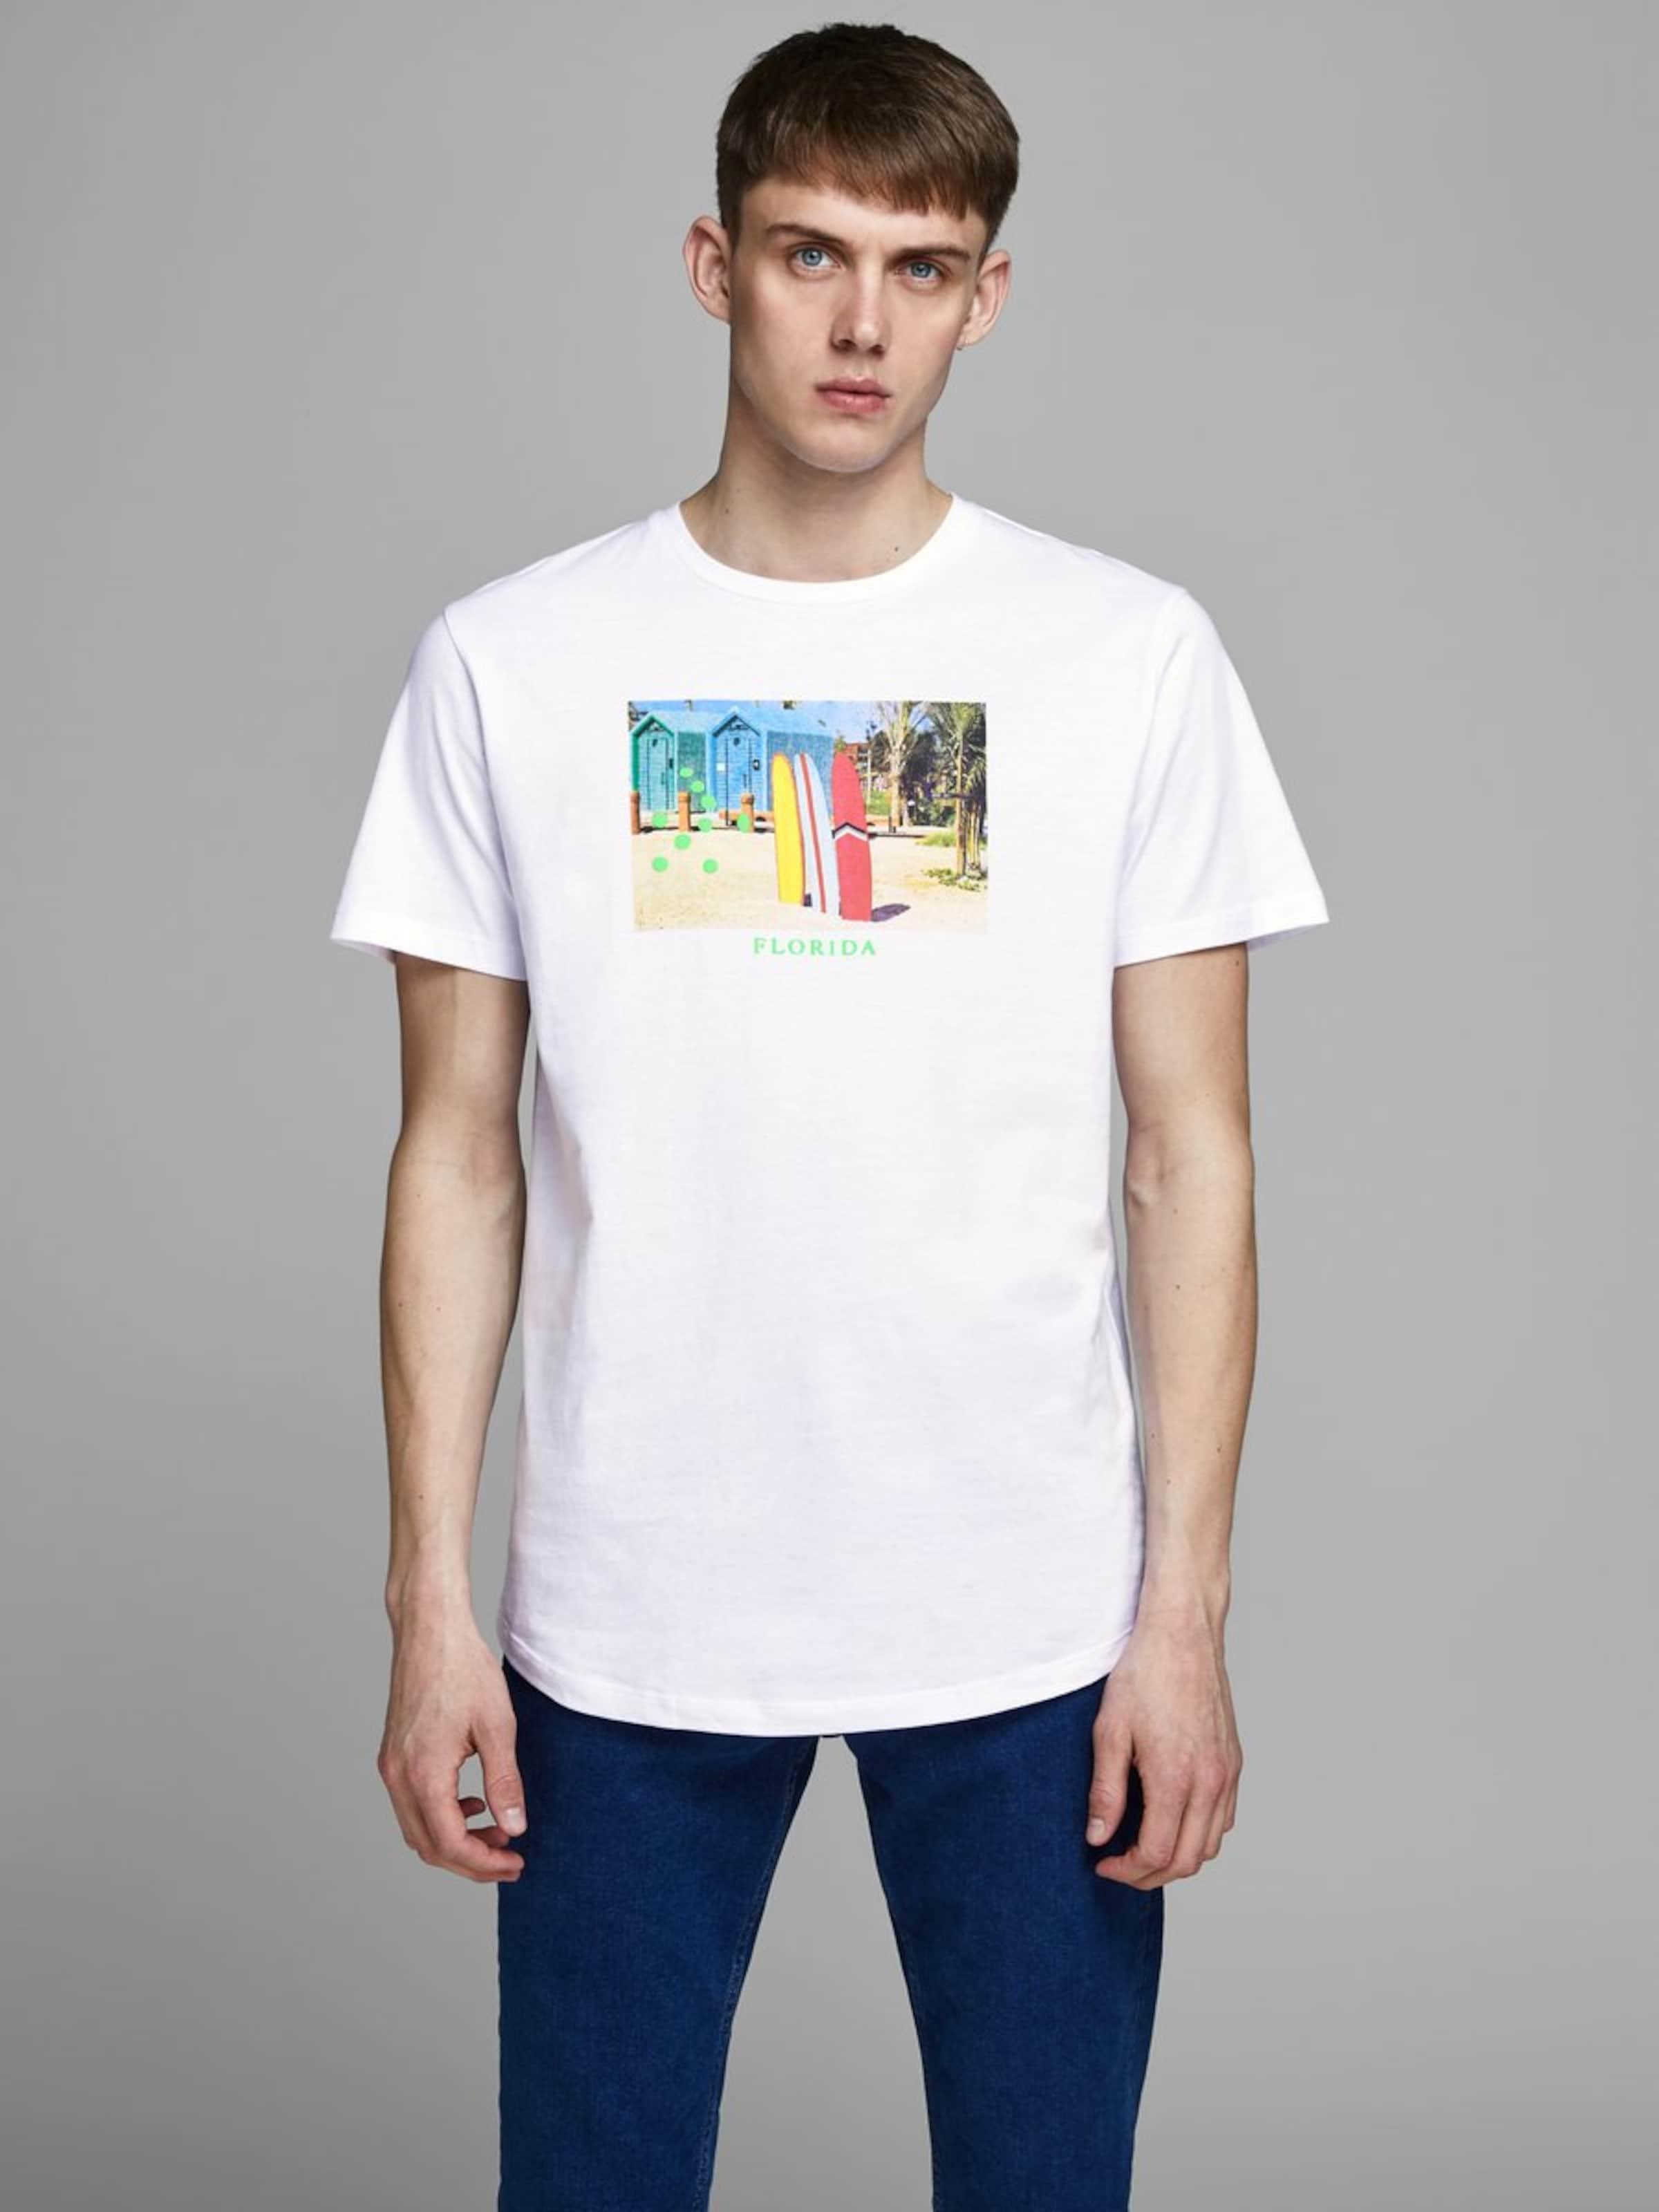 T In Jackamp; Jones shirt MischfarbenWeiß yOvNn0wm8P